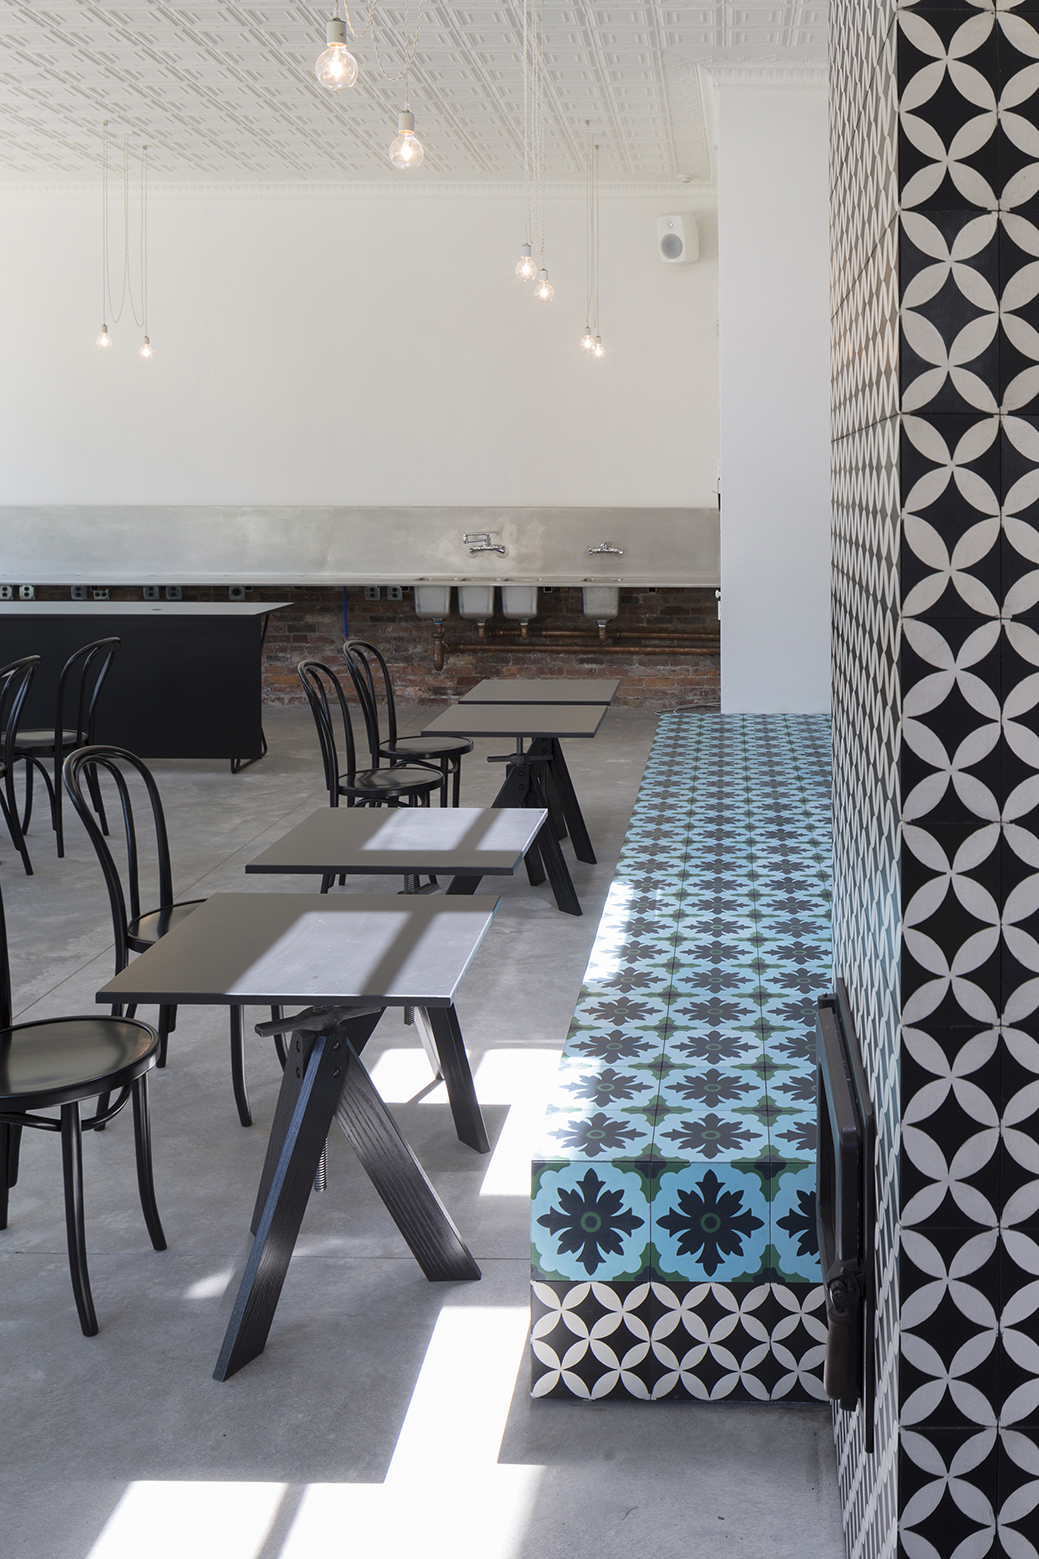 15 cafe fargo Cafe Fargo By Davidson Rafailidis